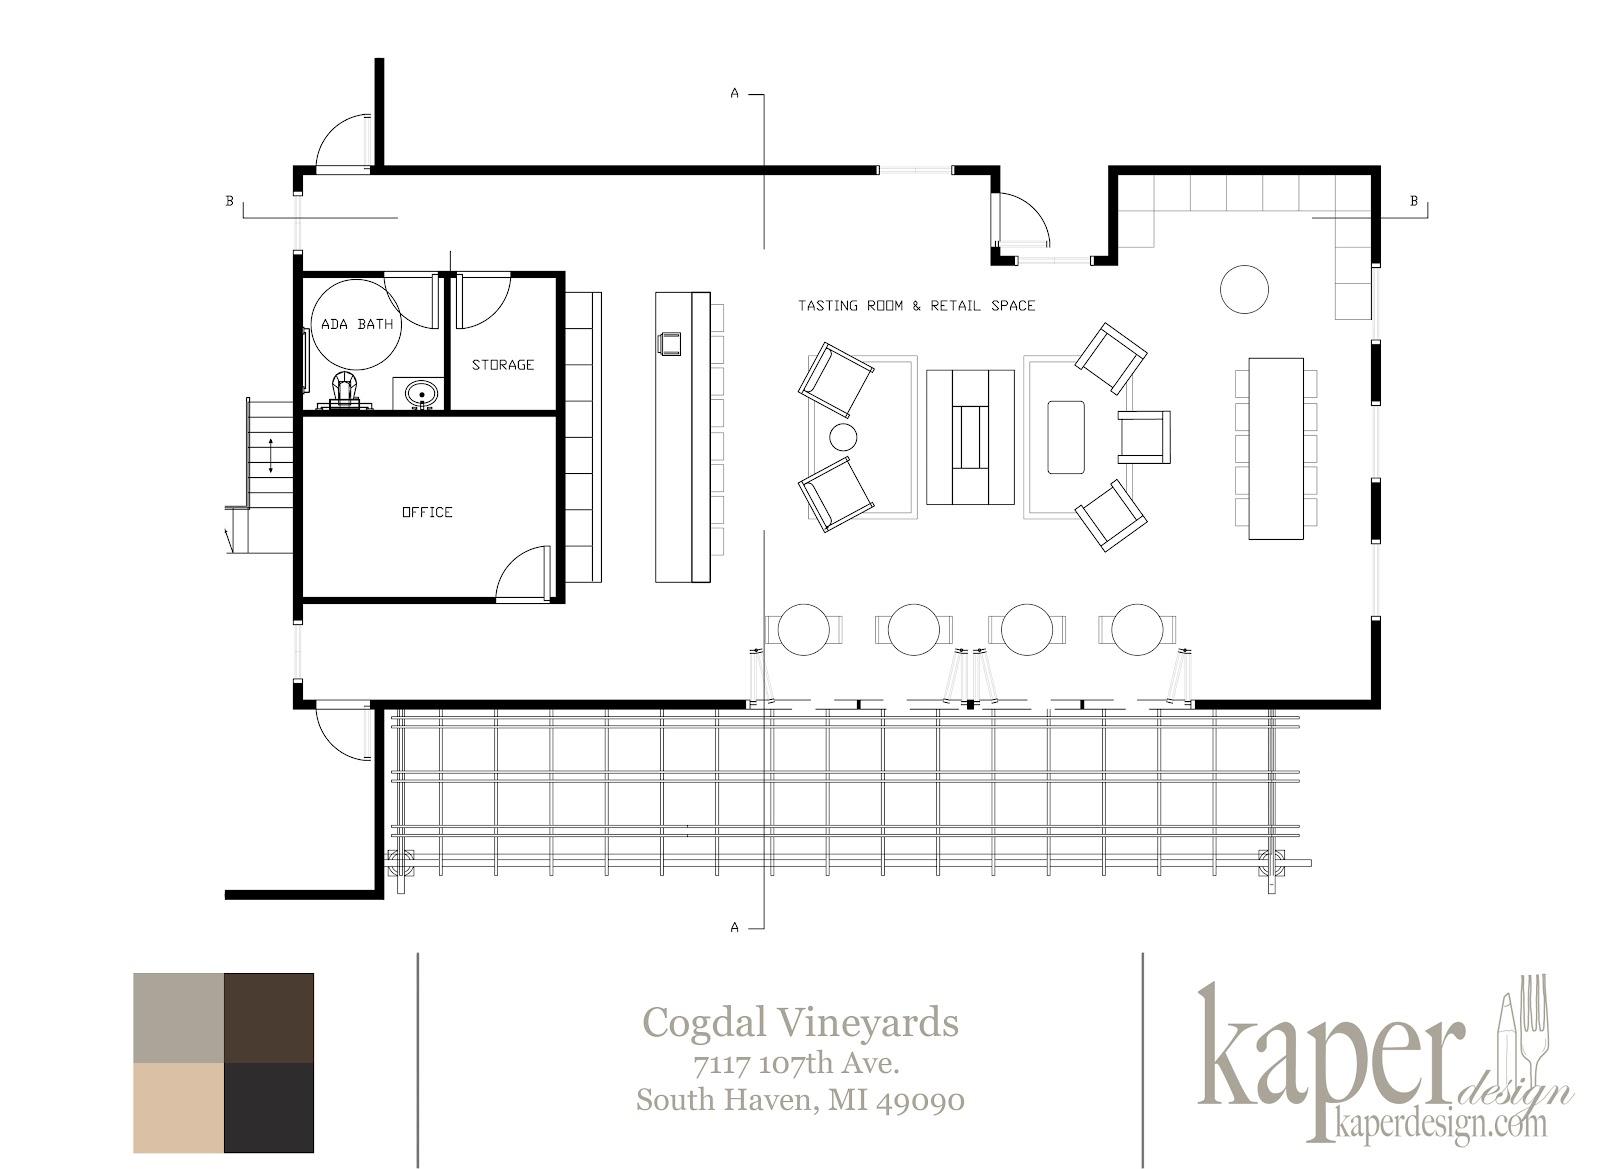 kaper design  restaurant  u0026 hospitality design inspiration